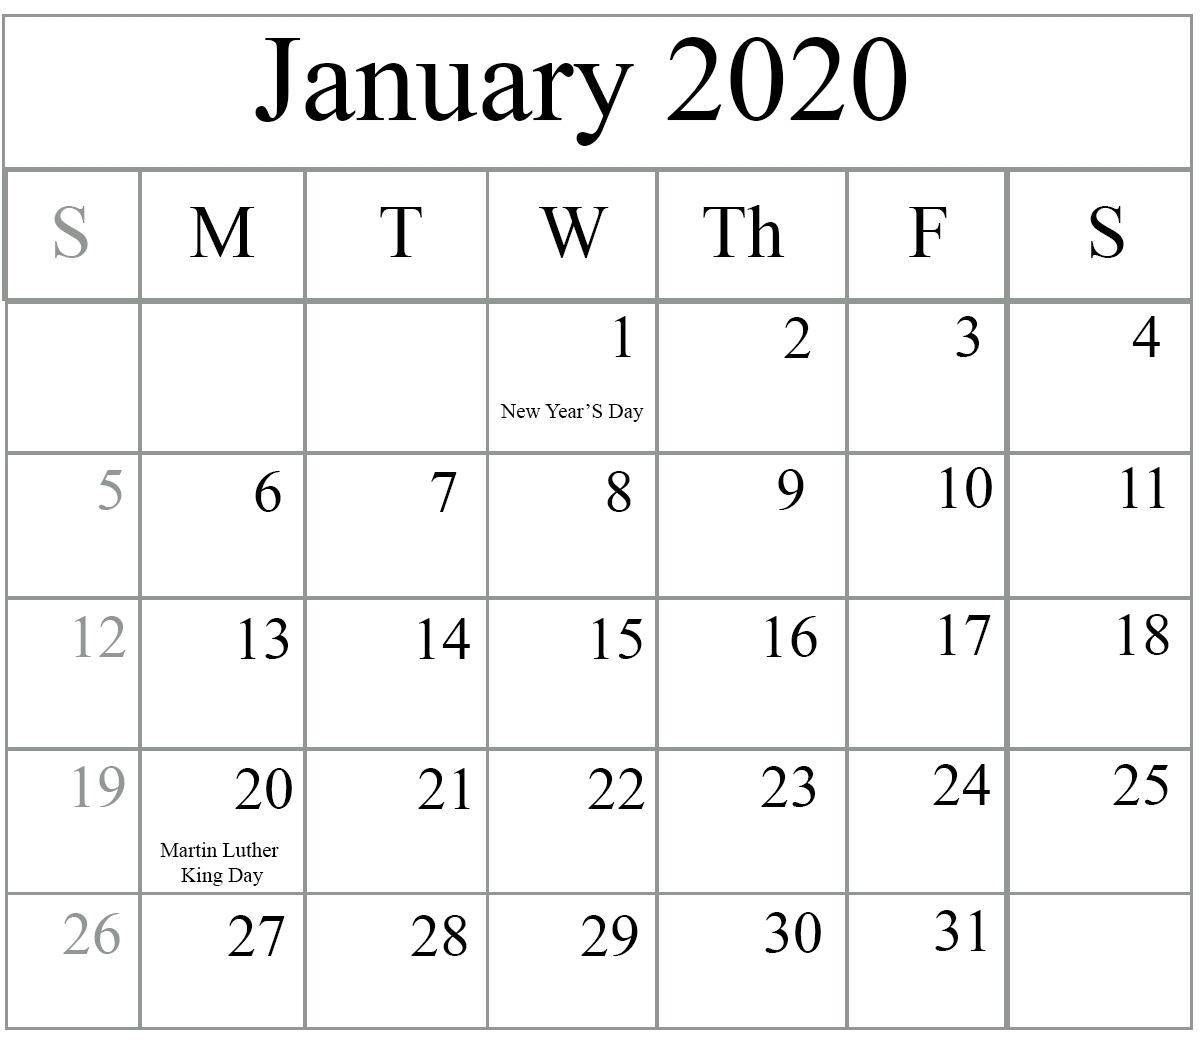 Blank January 2020 Calendar Printable In Pdf, Word, Excel-January 2020 Calendar Word